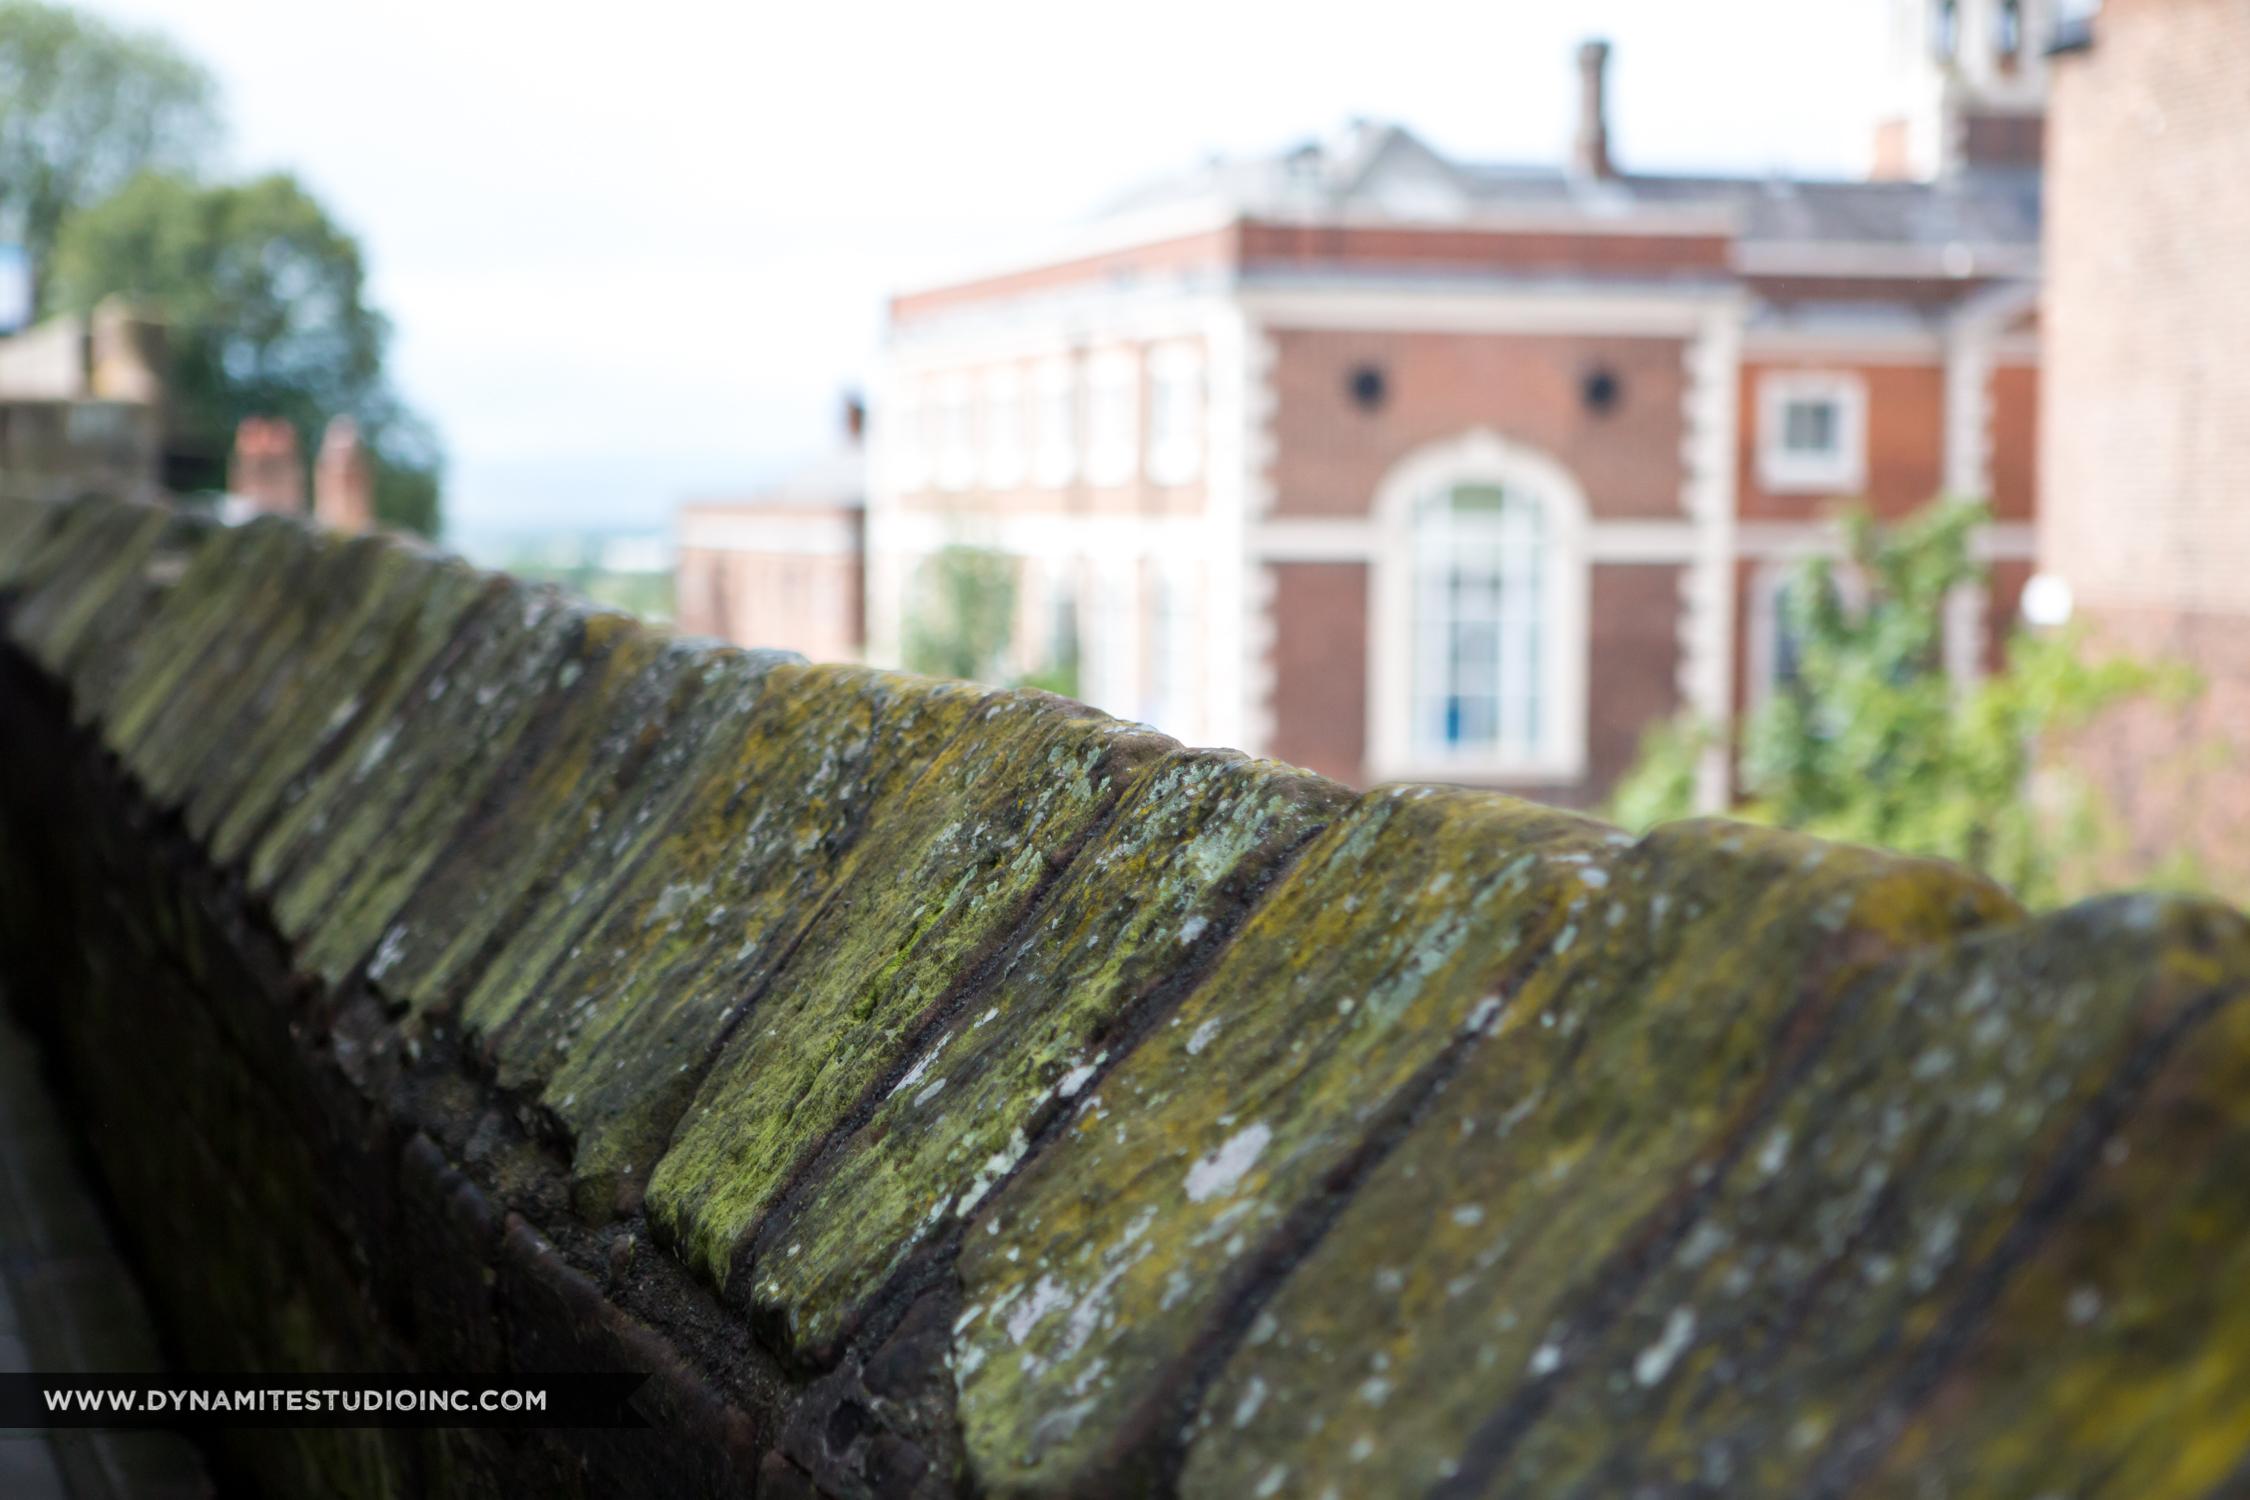 www.dynamitestudioinc.com-chester-england-travel-photography-orlando-32.jpg